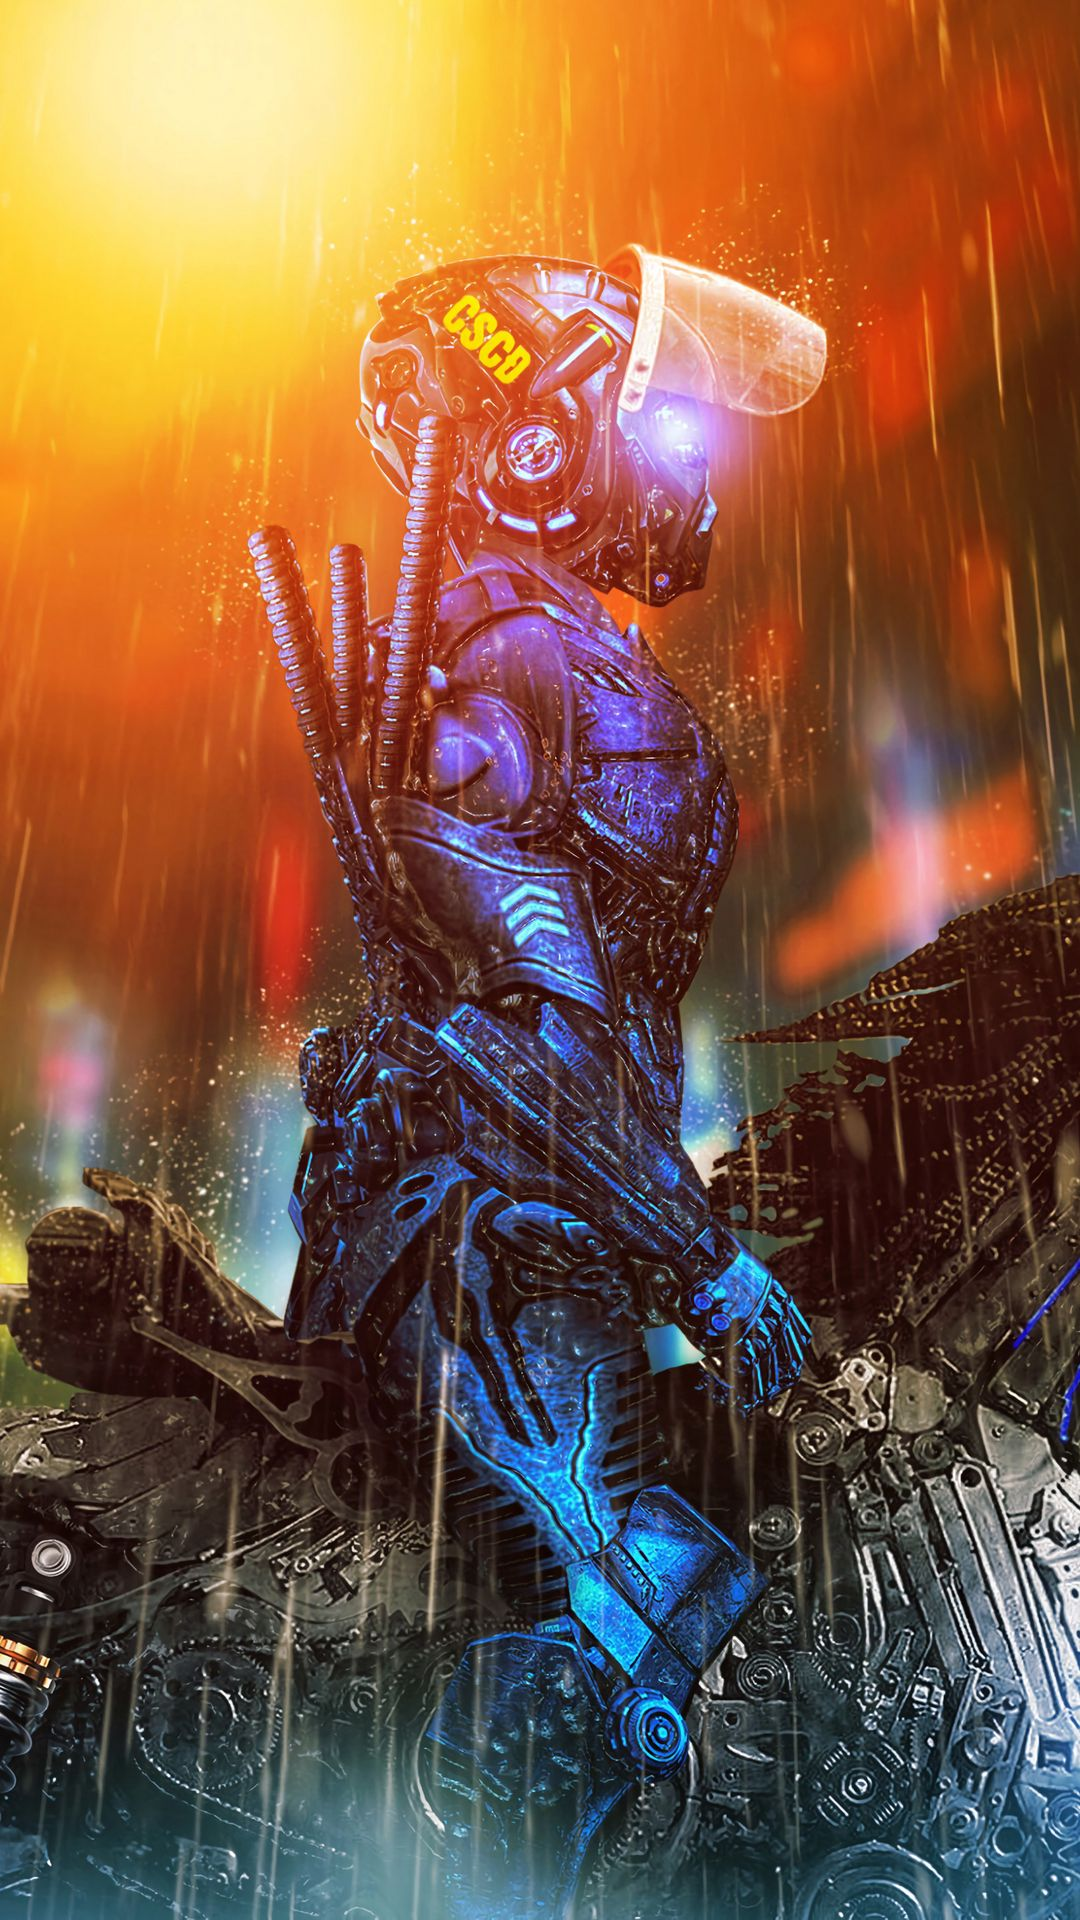 1080x1920 Wallpaper cyborg, rider, cyberpunk, art